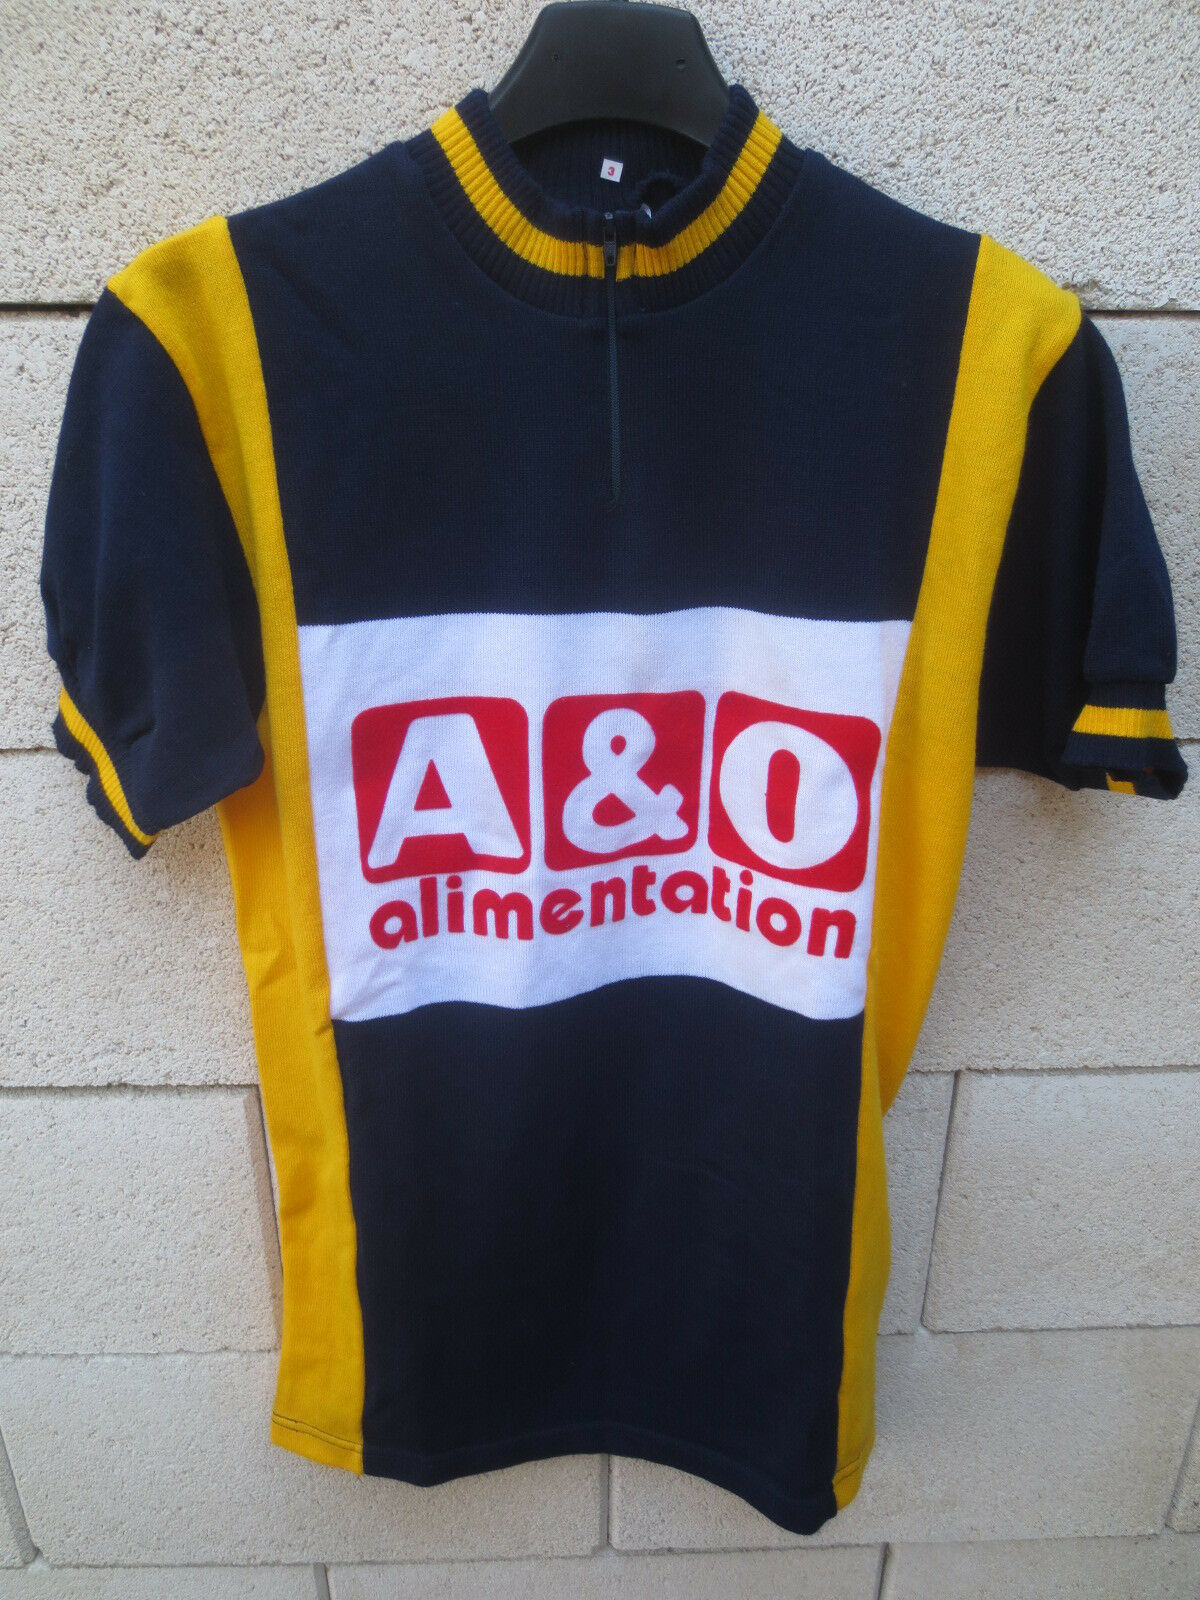 Maillot cycliste A & O ALIMENTATION vintage cycling jersey trikot camiseta 3 M